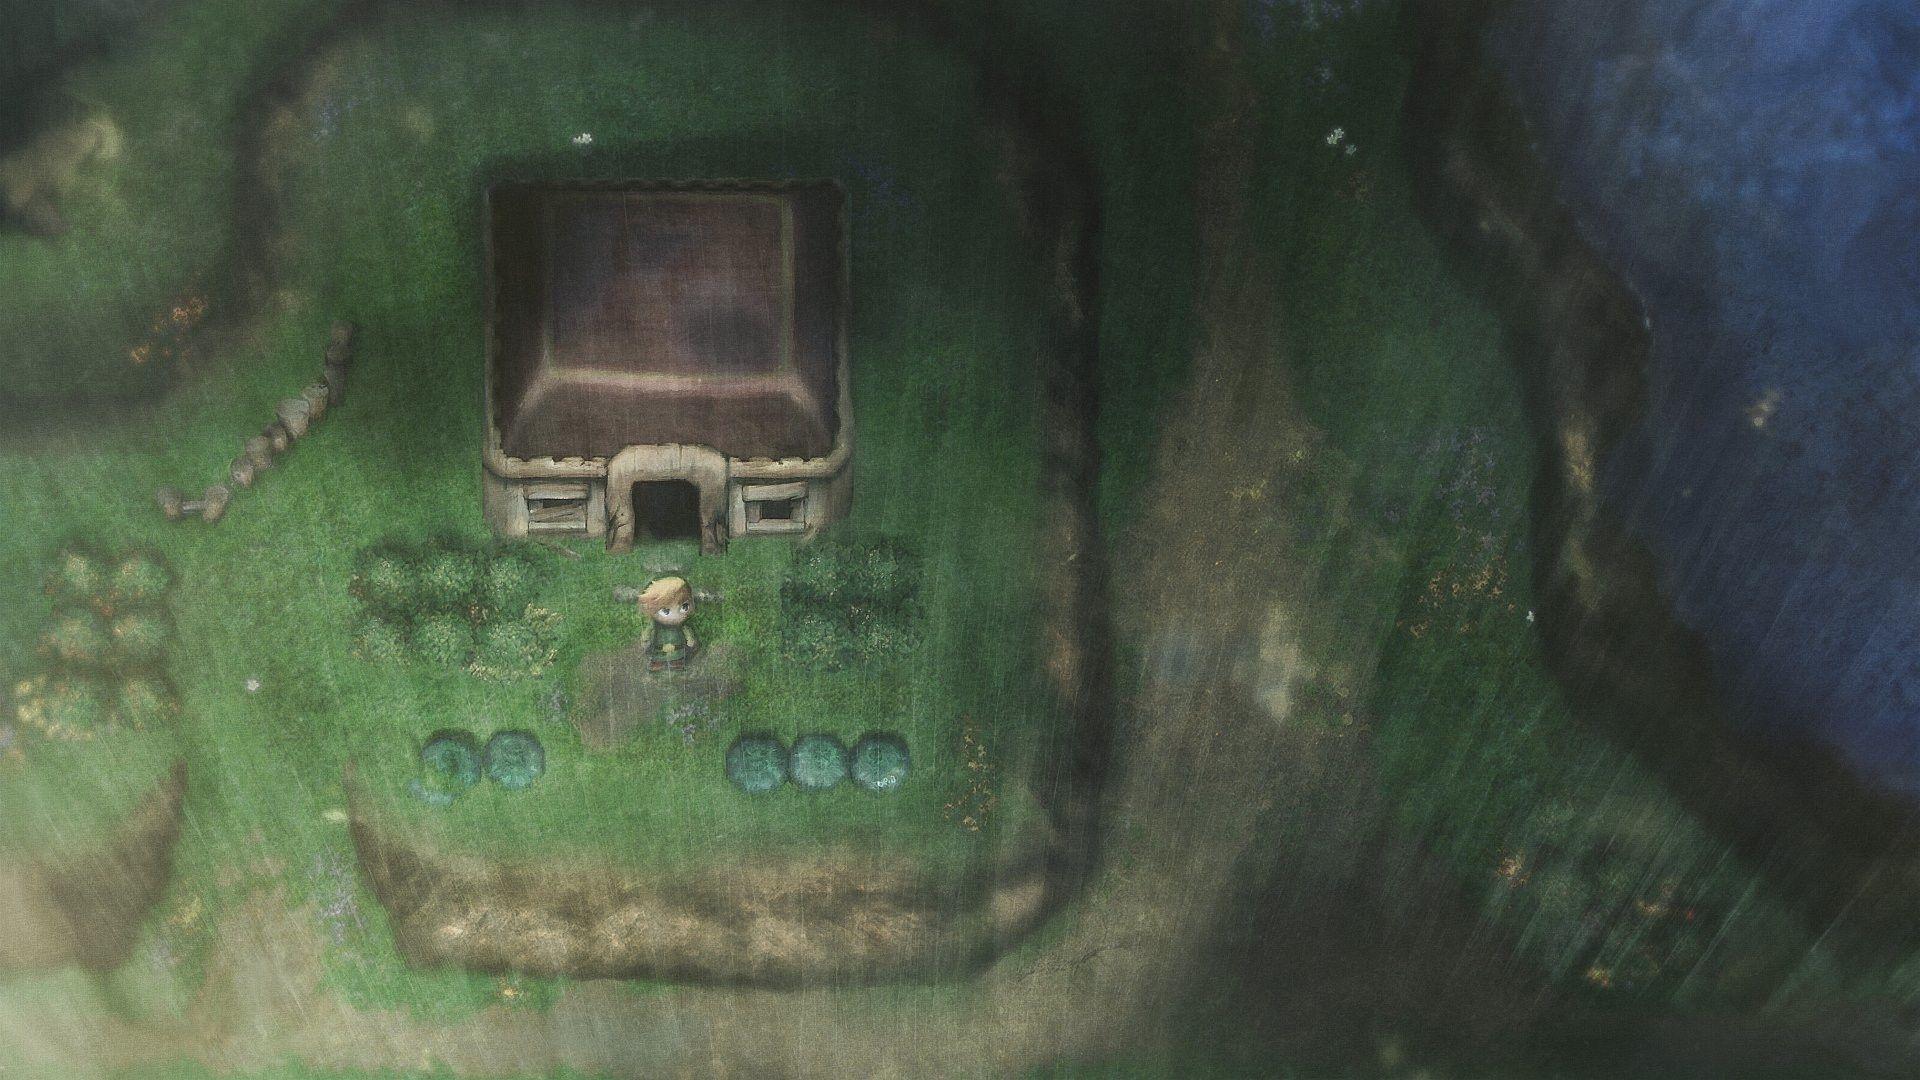 Zelda wallpapers for mobile users Album on Imgur 1920×1080